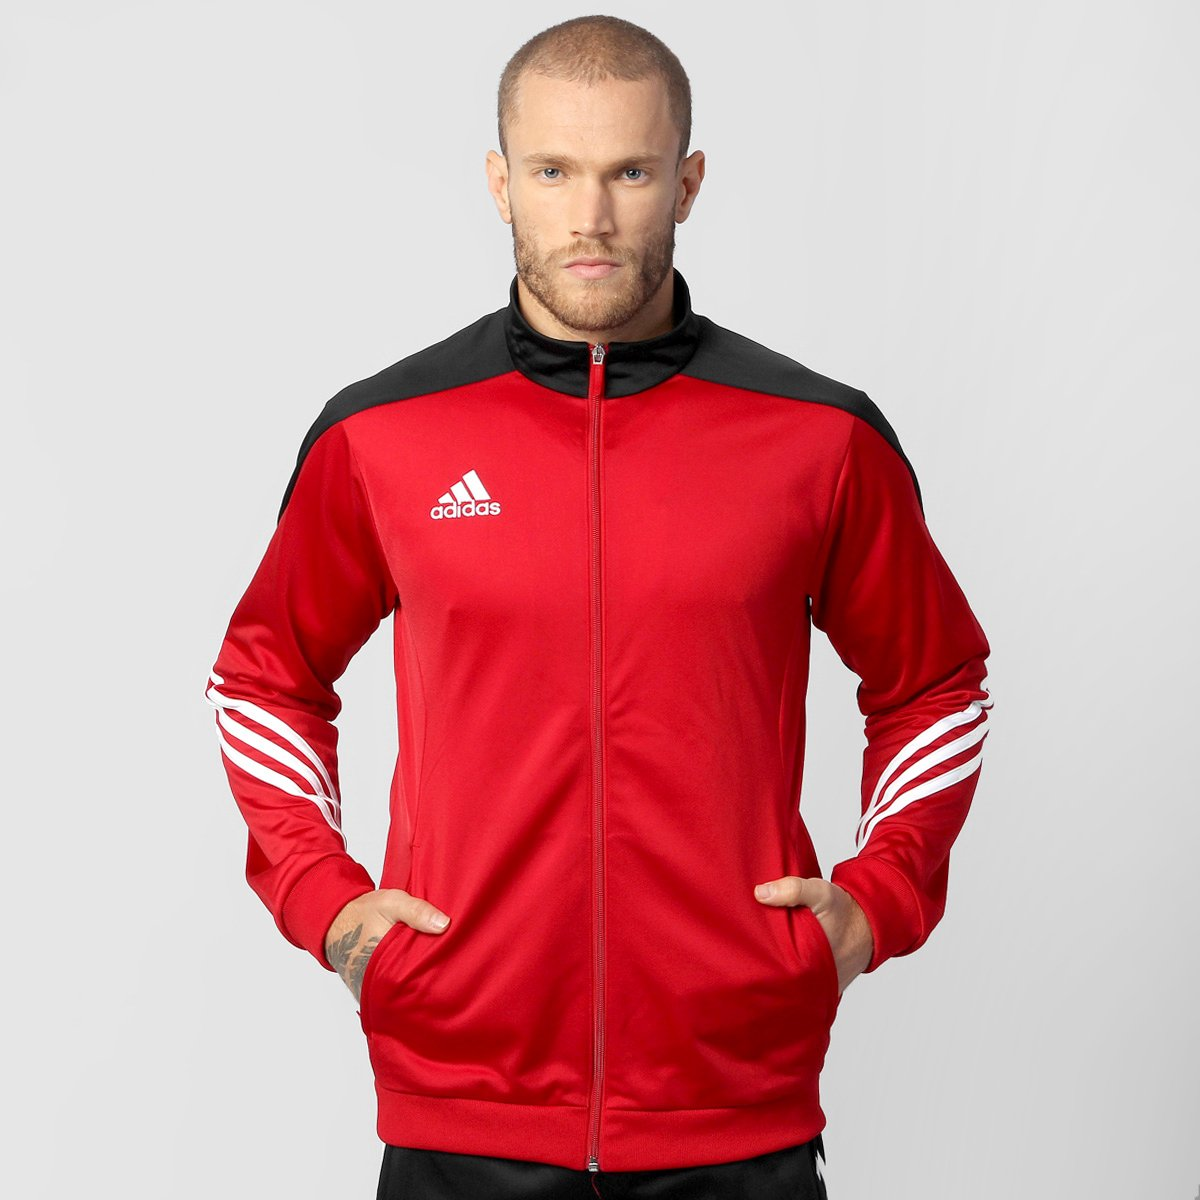 Agasalho Adidas Sere 14 Masculino - Compre Agora  a2d301ced0a6e